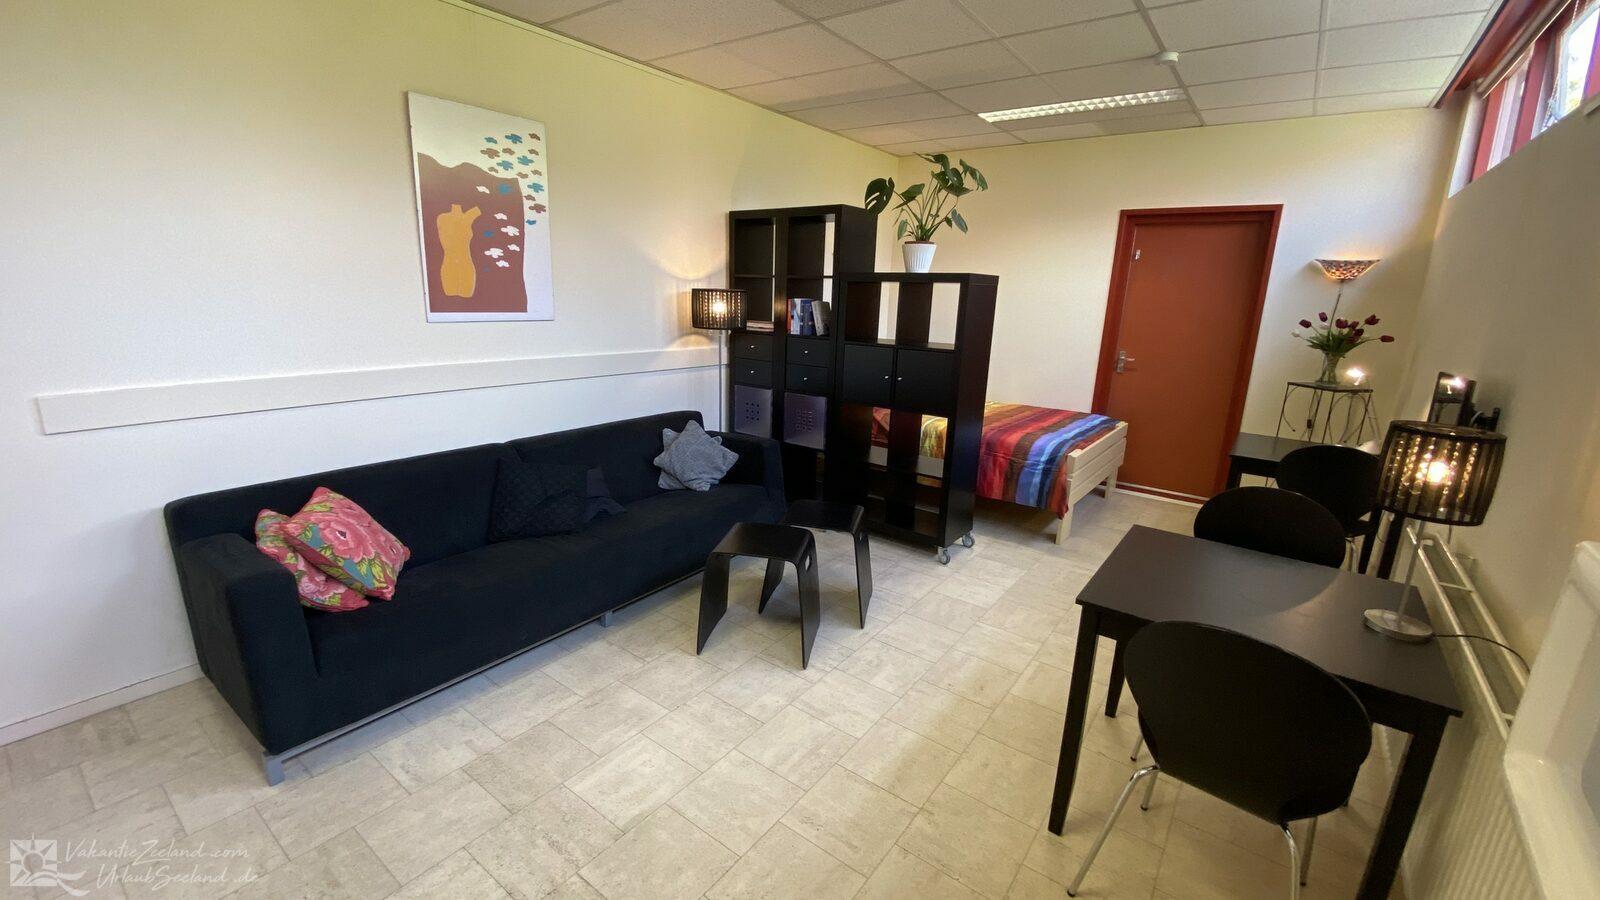 VZ1020 Studio in Vlissingen